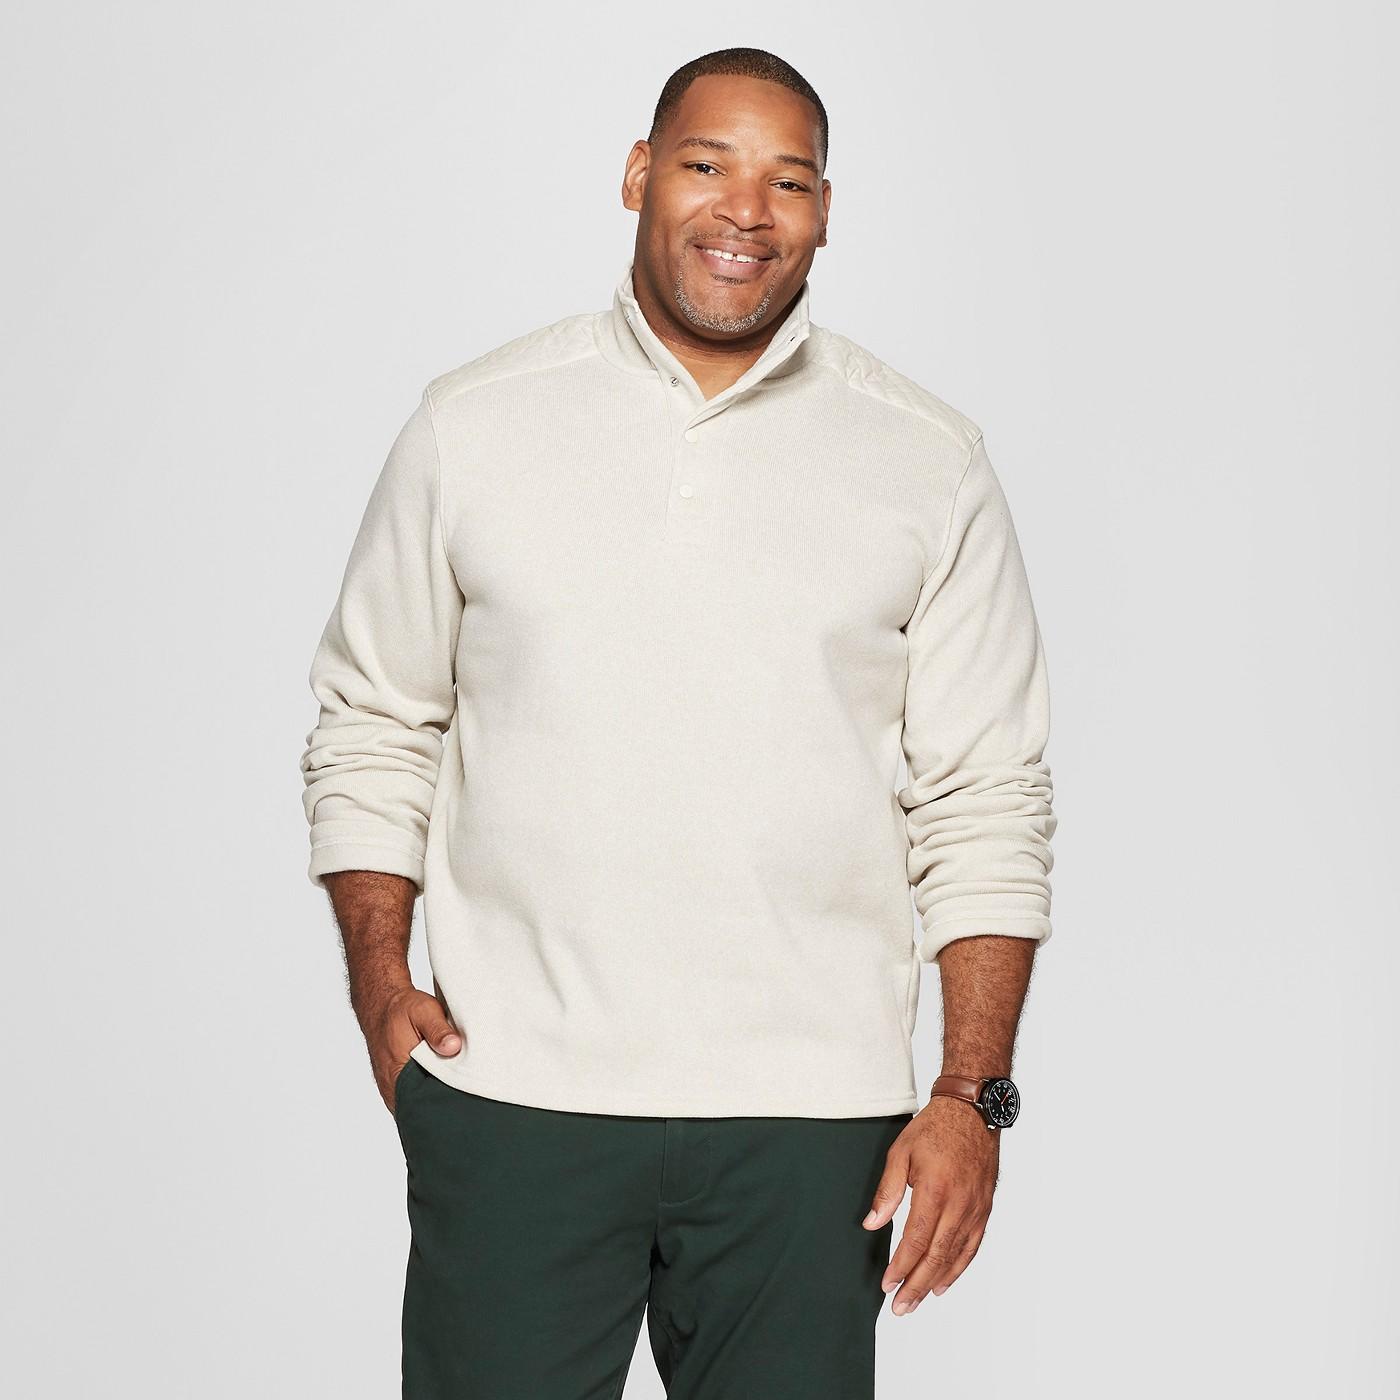 Men's Big & Tall Sweater Fleece Quarter Snap on Clearance for $16.49 (Reg. $32.99)!